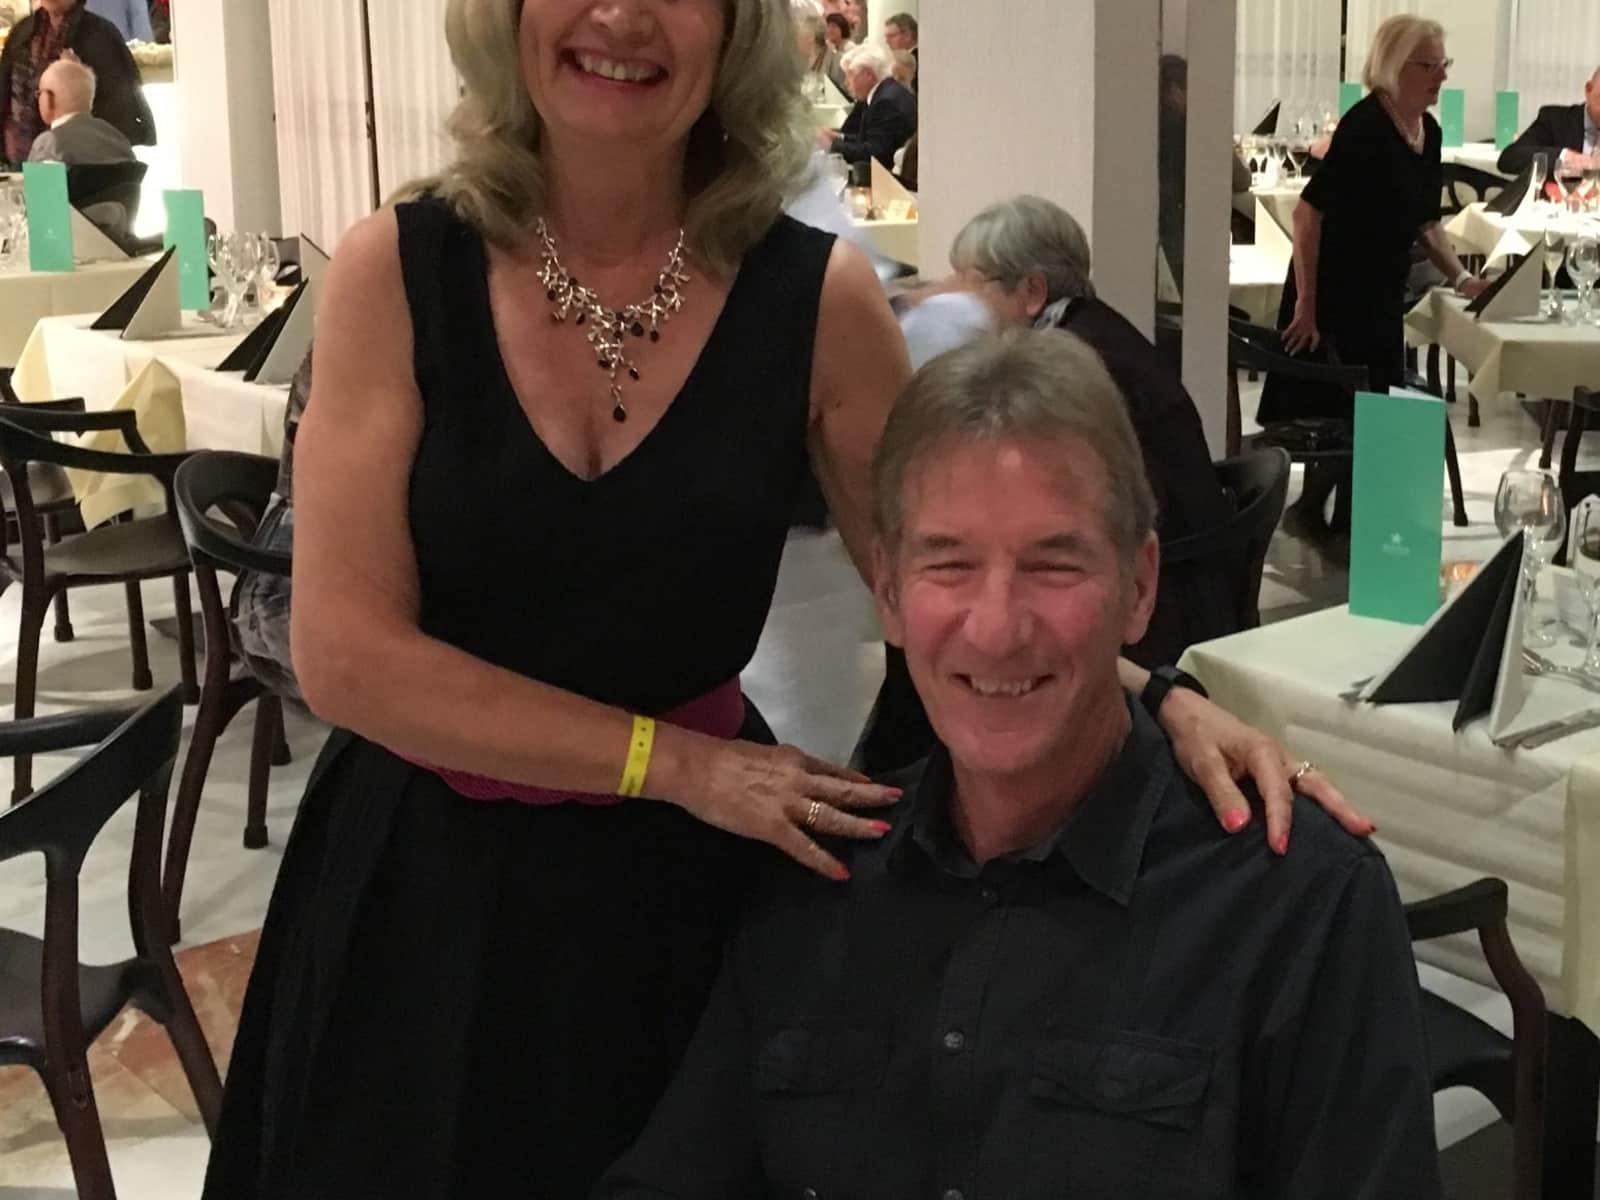 Brenda & Robert from Calahonda, Spain